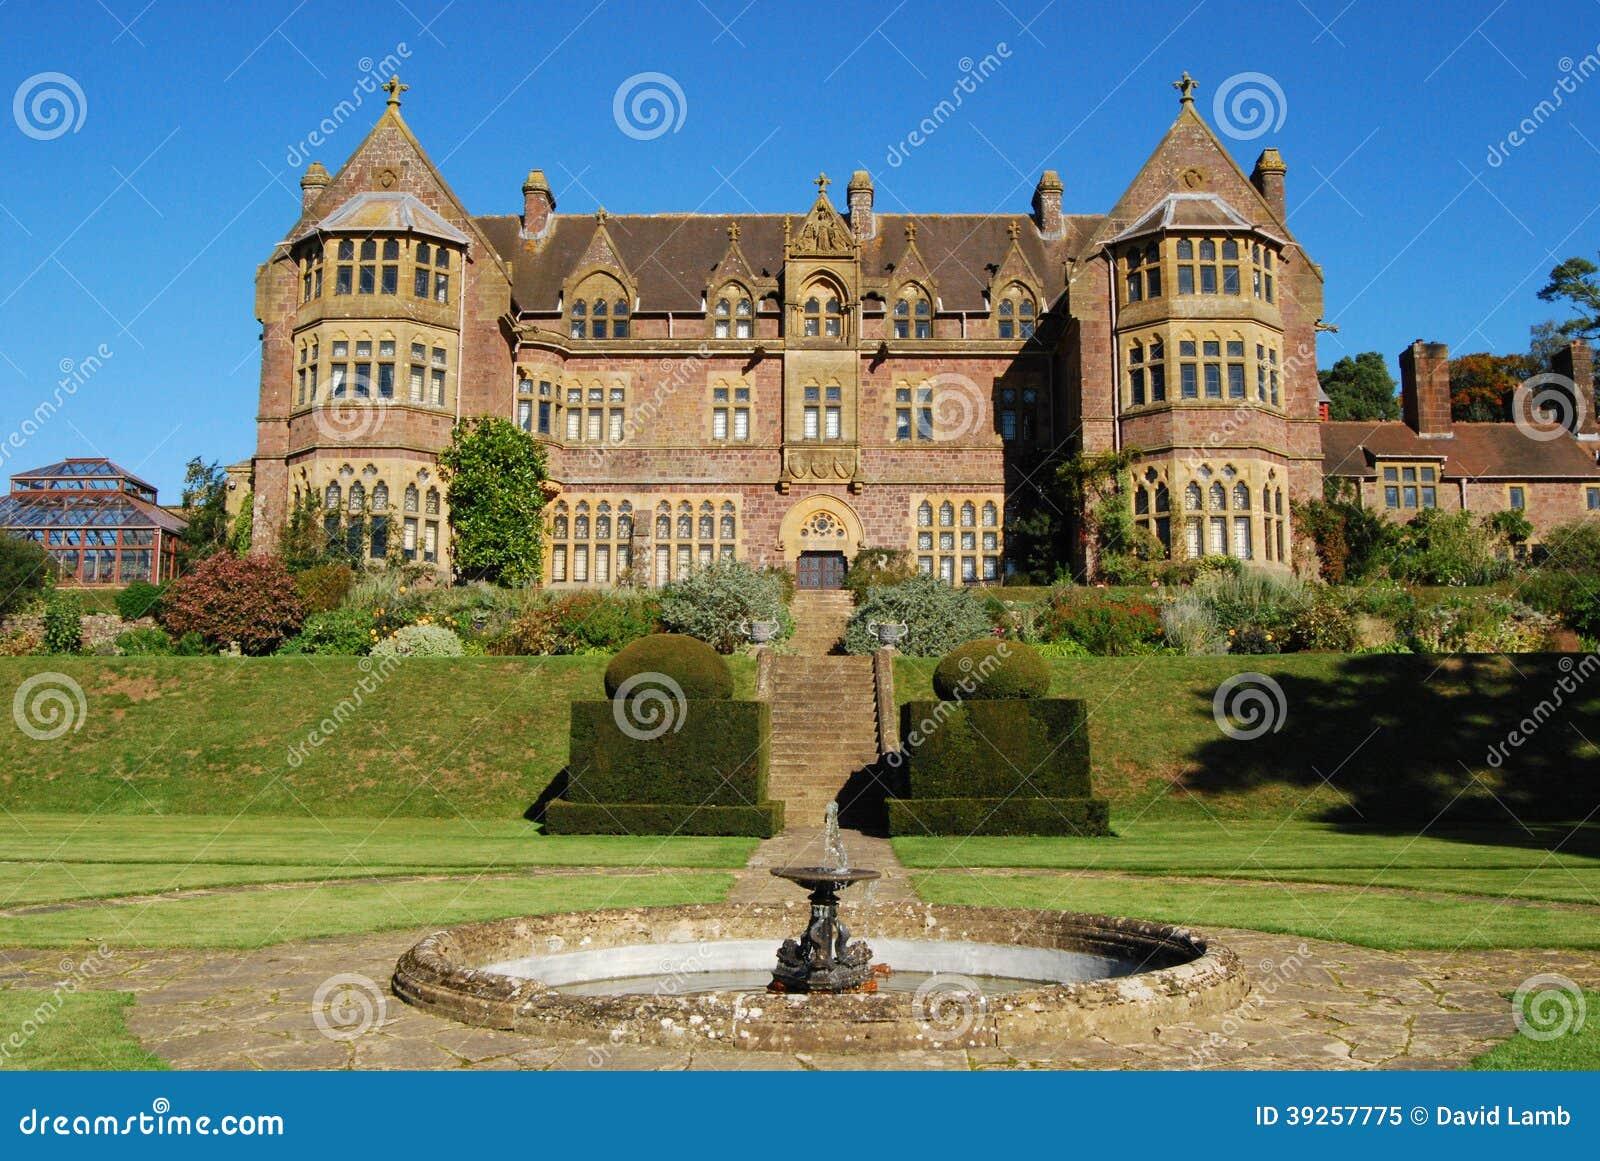 Maison de campagne anglaise dorset photo stock image 39257775 - Objet typique anglais ...